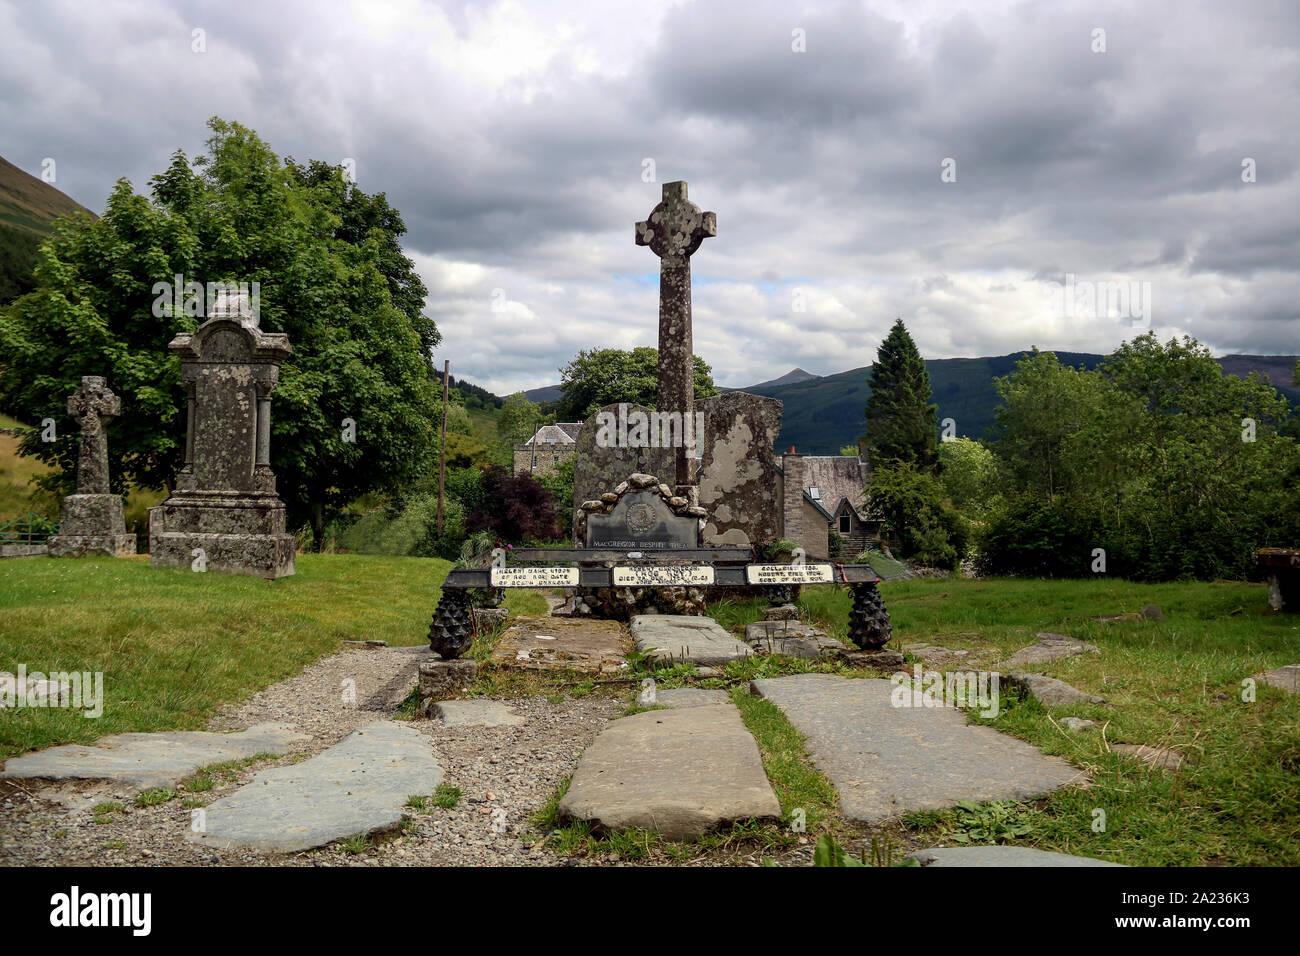 Grave of Scottish patriot Rob Roy MacGregor in Balquhidder Scotland Stock Photo